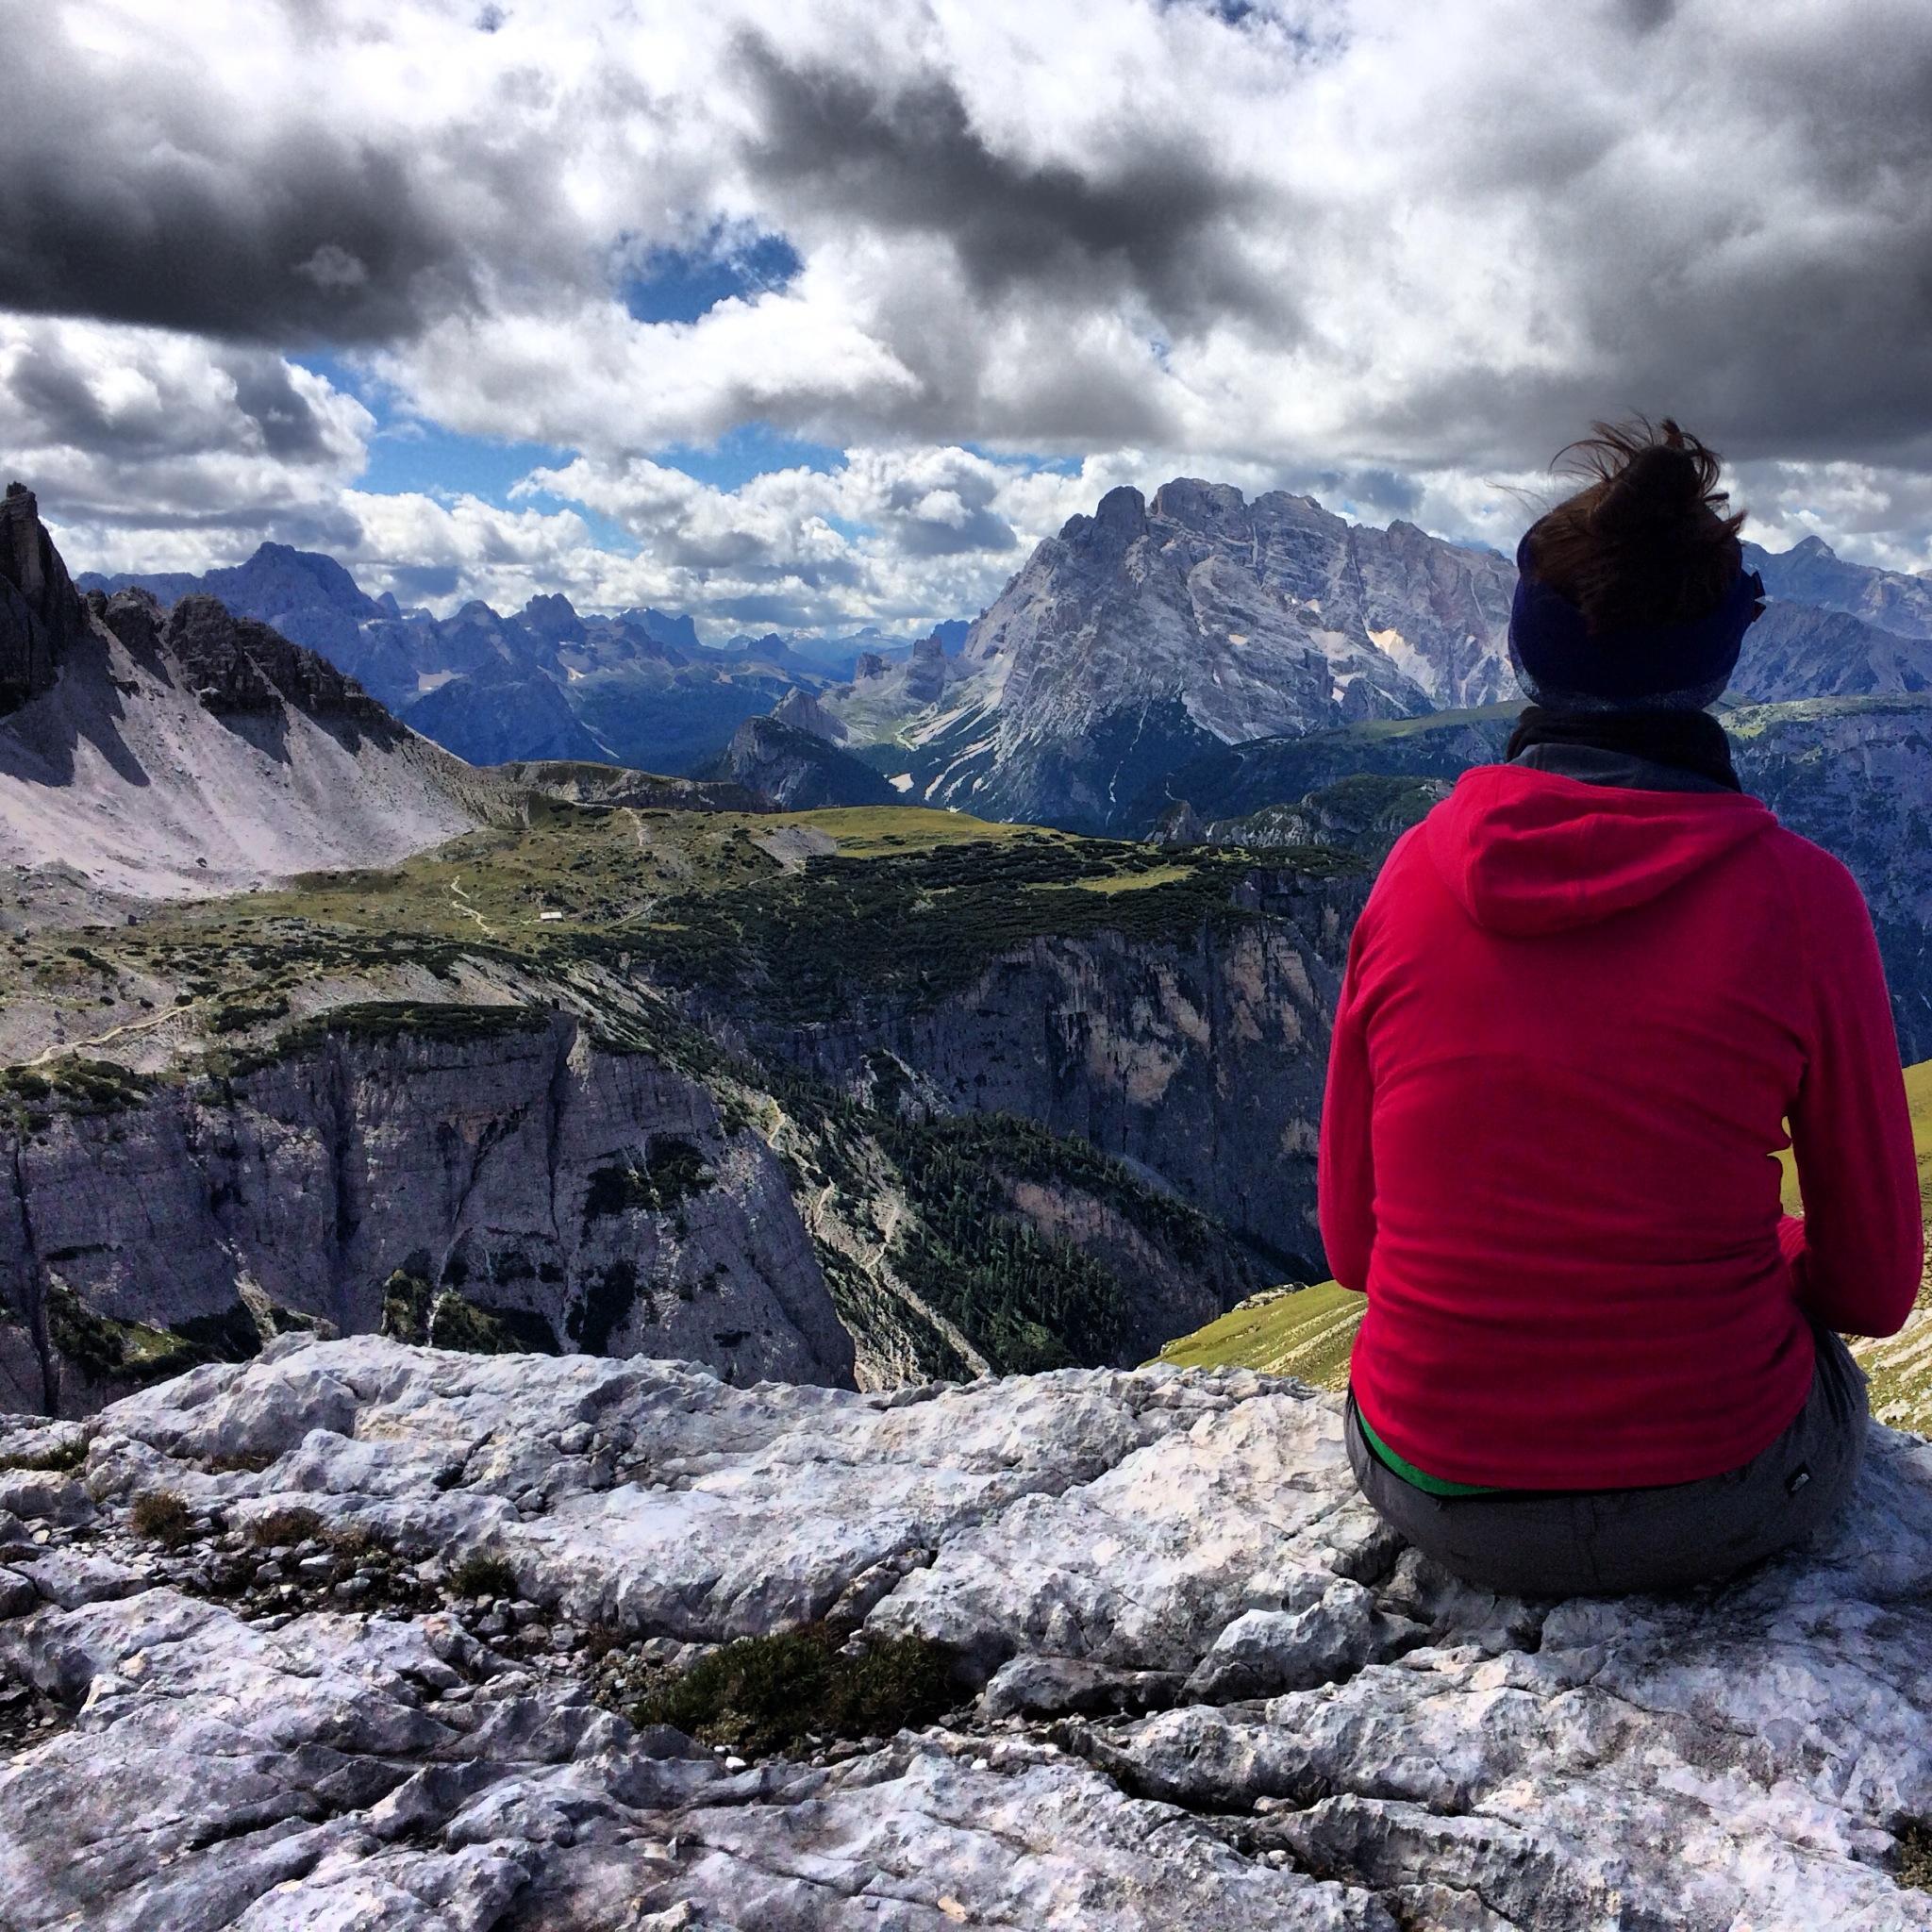 Jo hiking near the Tre Cime di Lavaredo in the Italian Dolomites